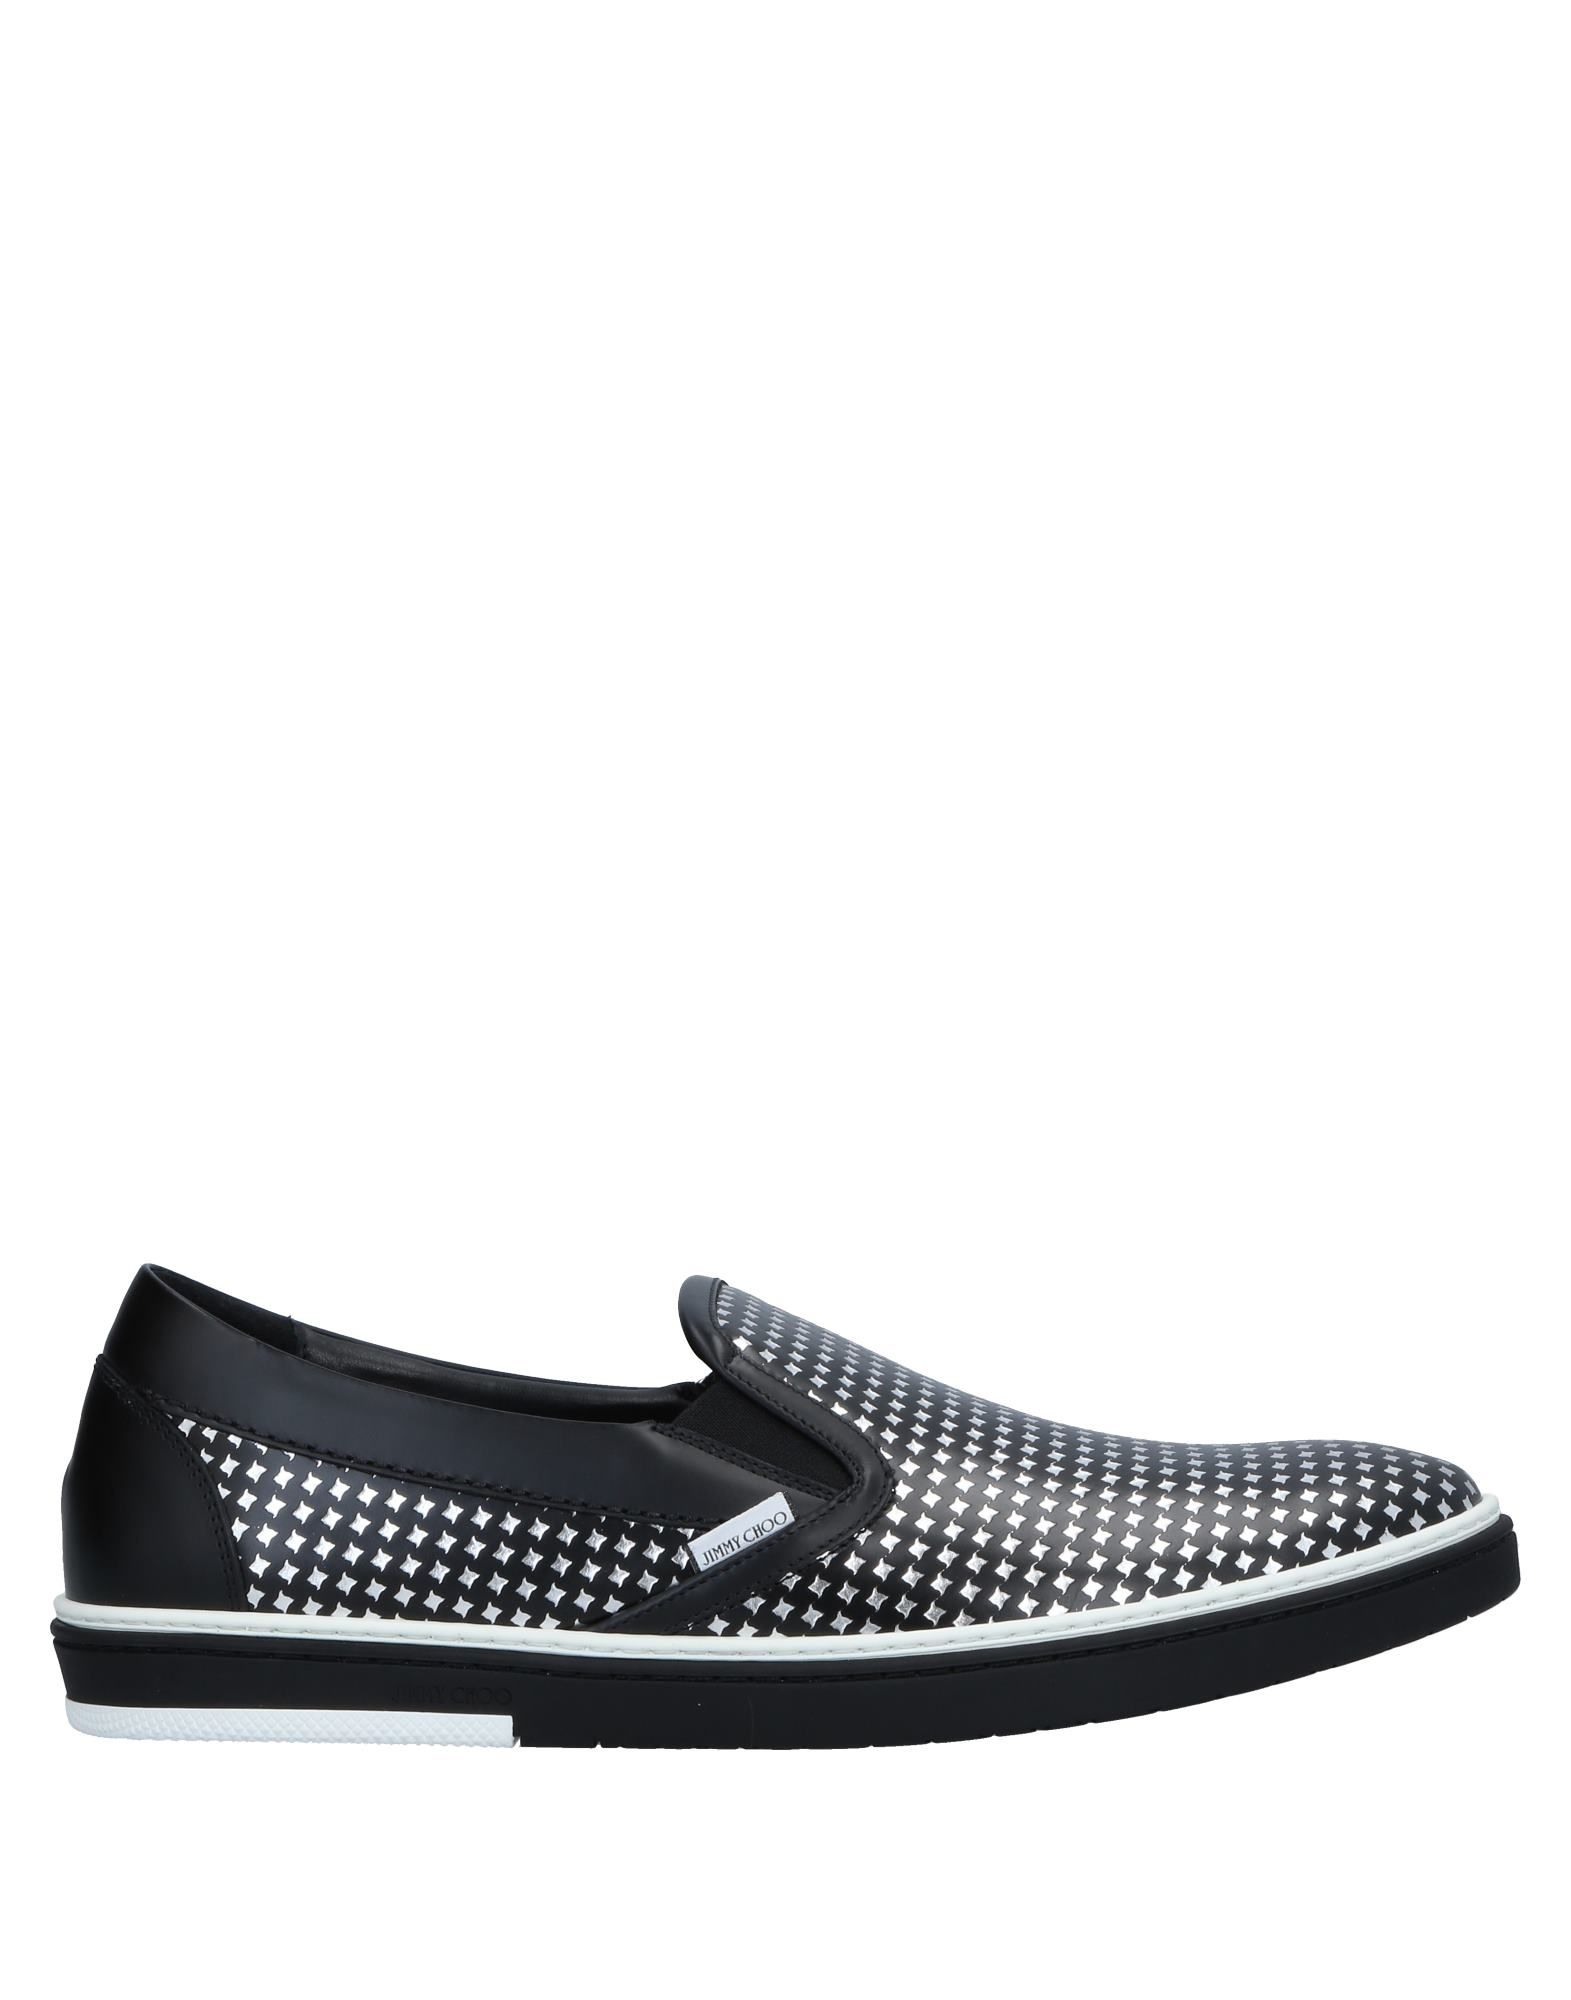 Sneakers Jimmy Choo Homme - Sneakers Jimmy Choo  Noir Spécial temps limité